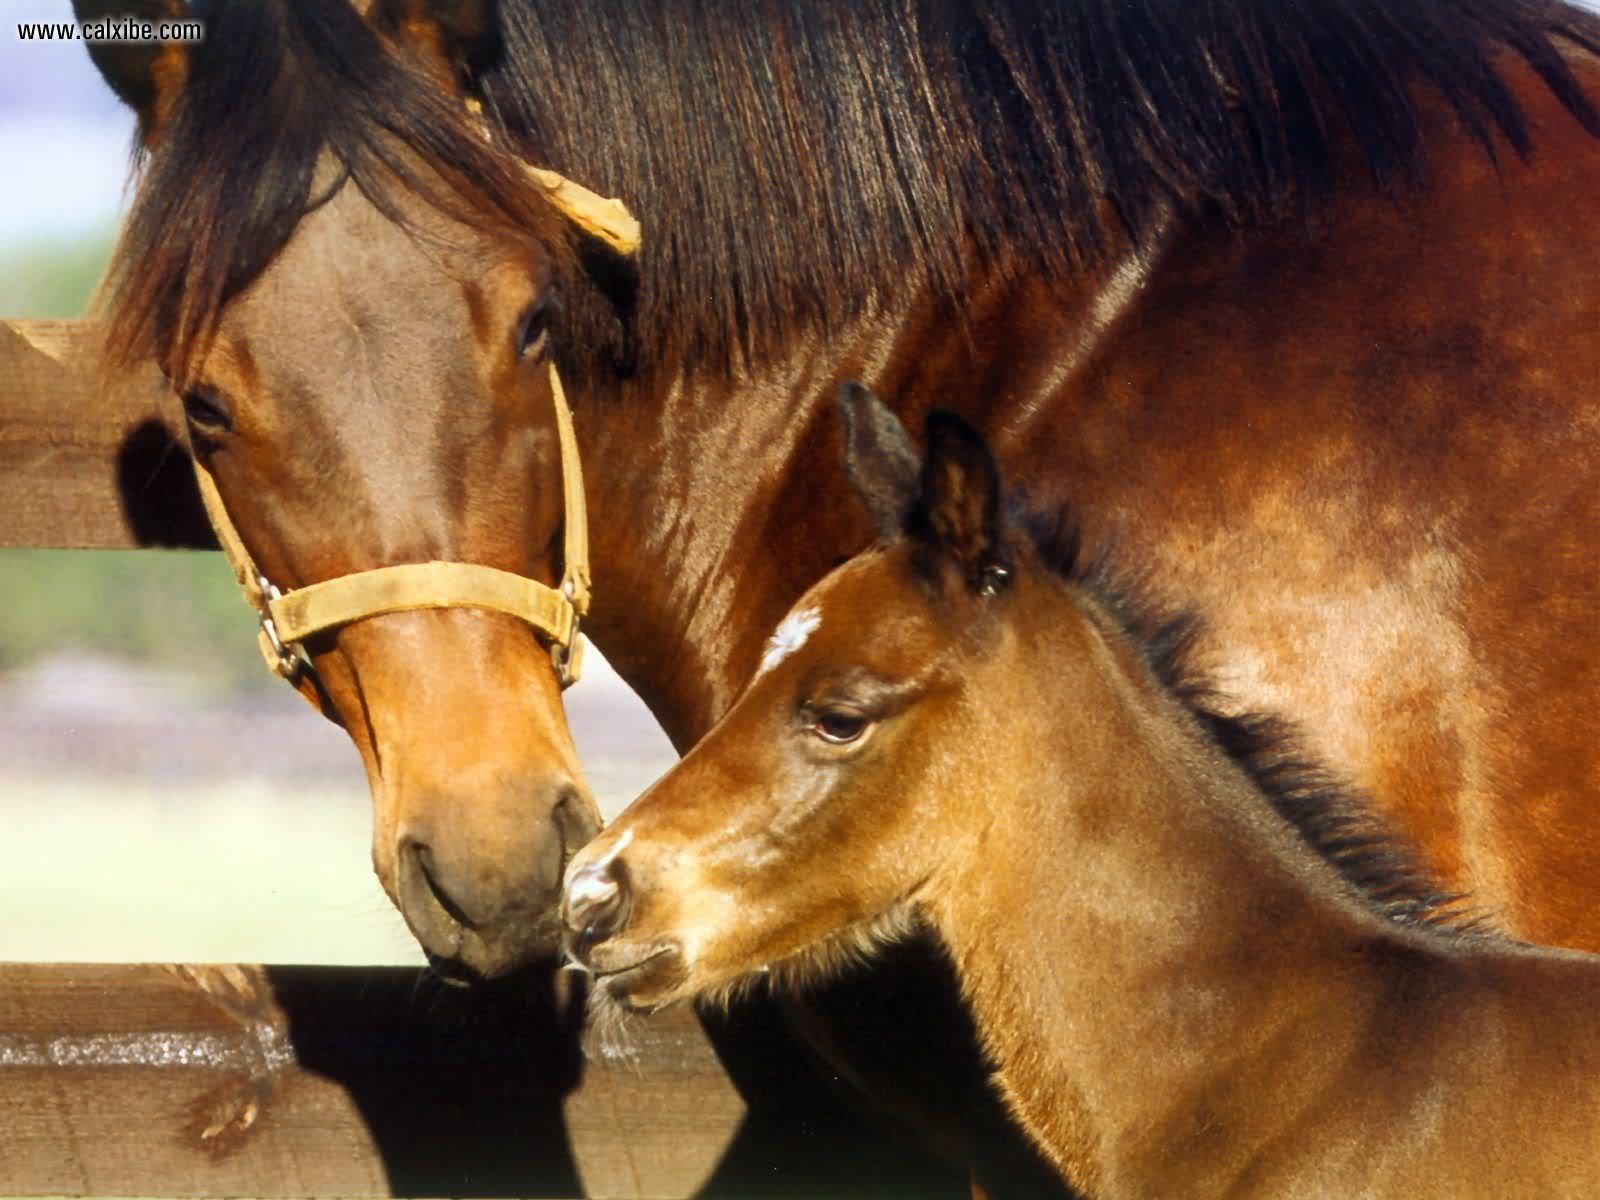 Horse | 馬 | Ngựa S4wQuarterHorses007